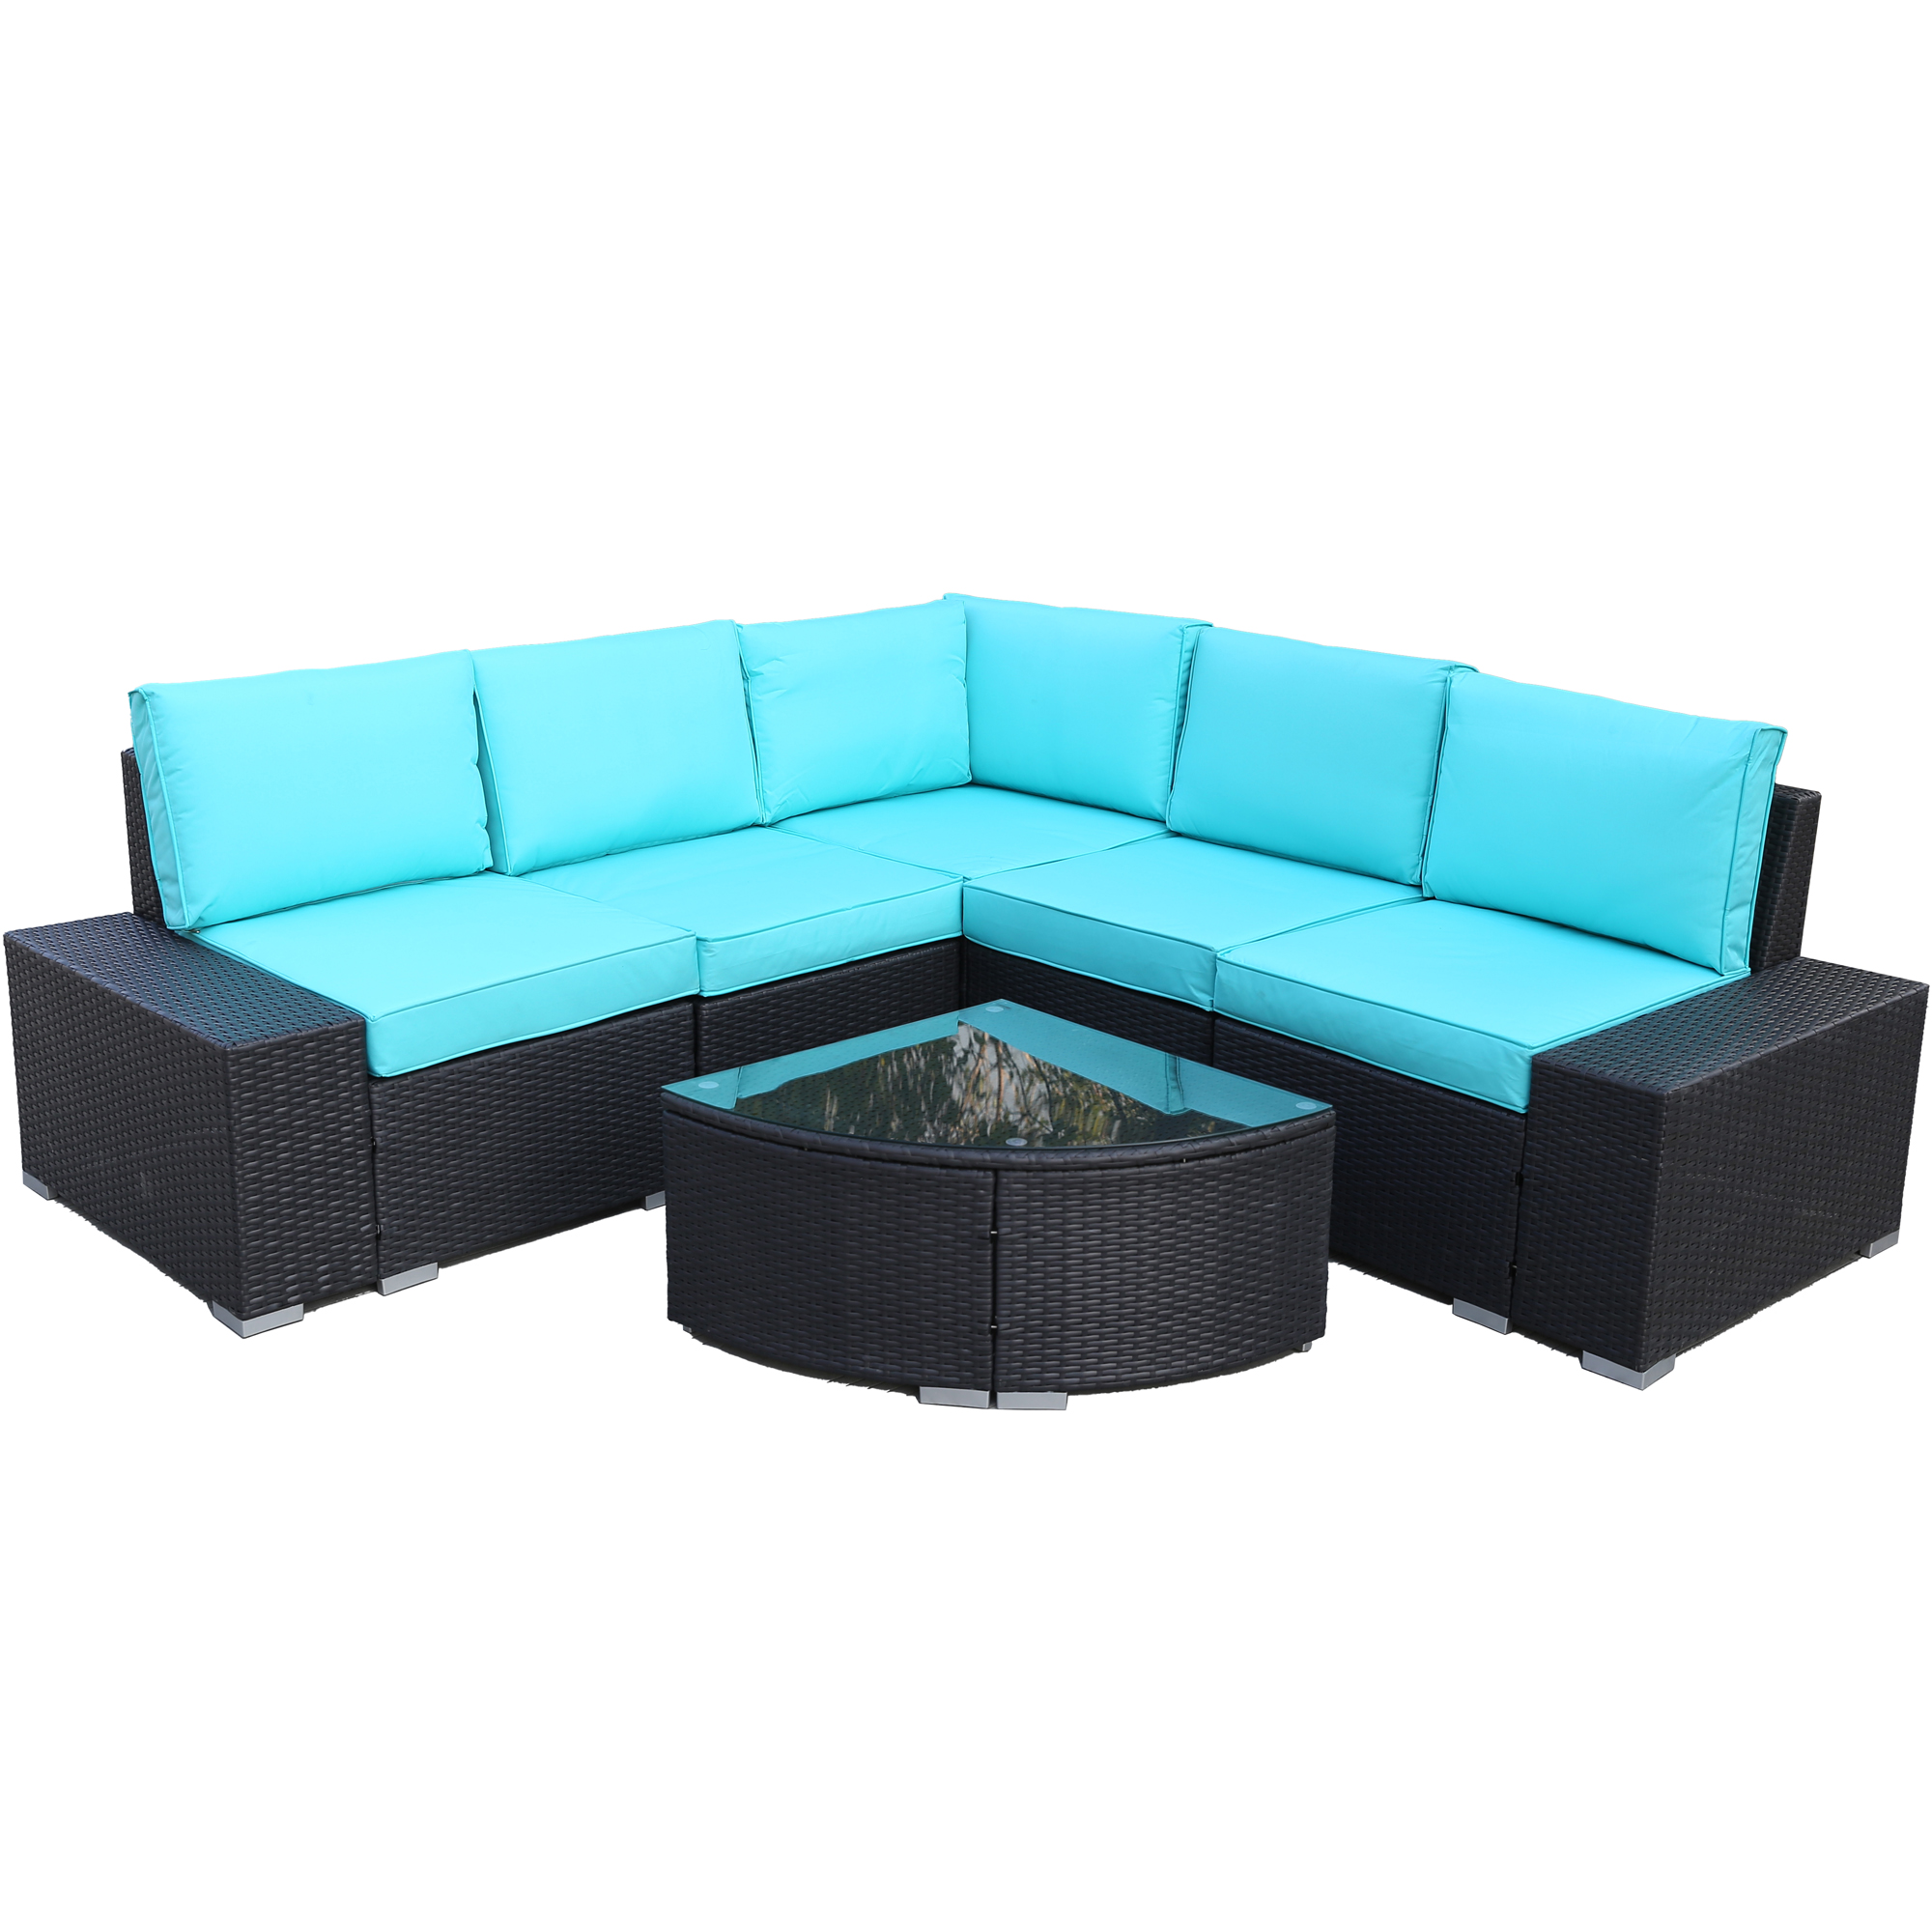 URHOEMPRO Outdoor Wicker Sectional Sofa Set, 6 Piece Patio ...